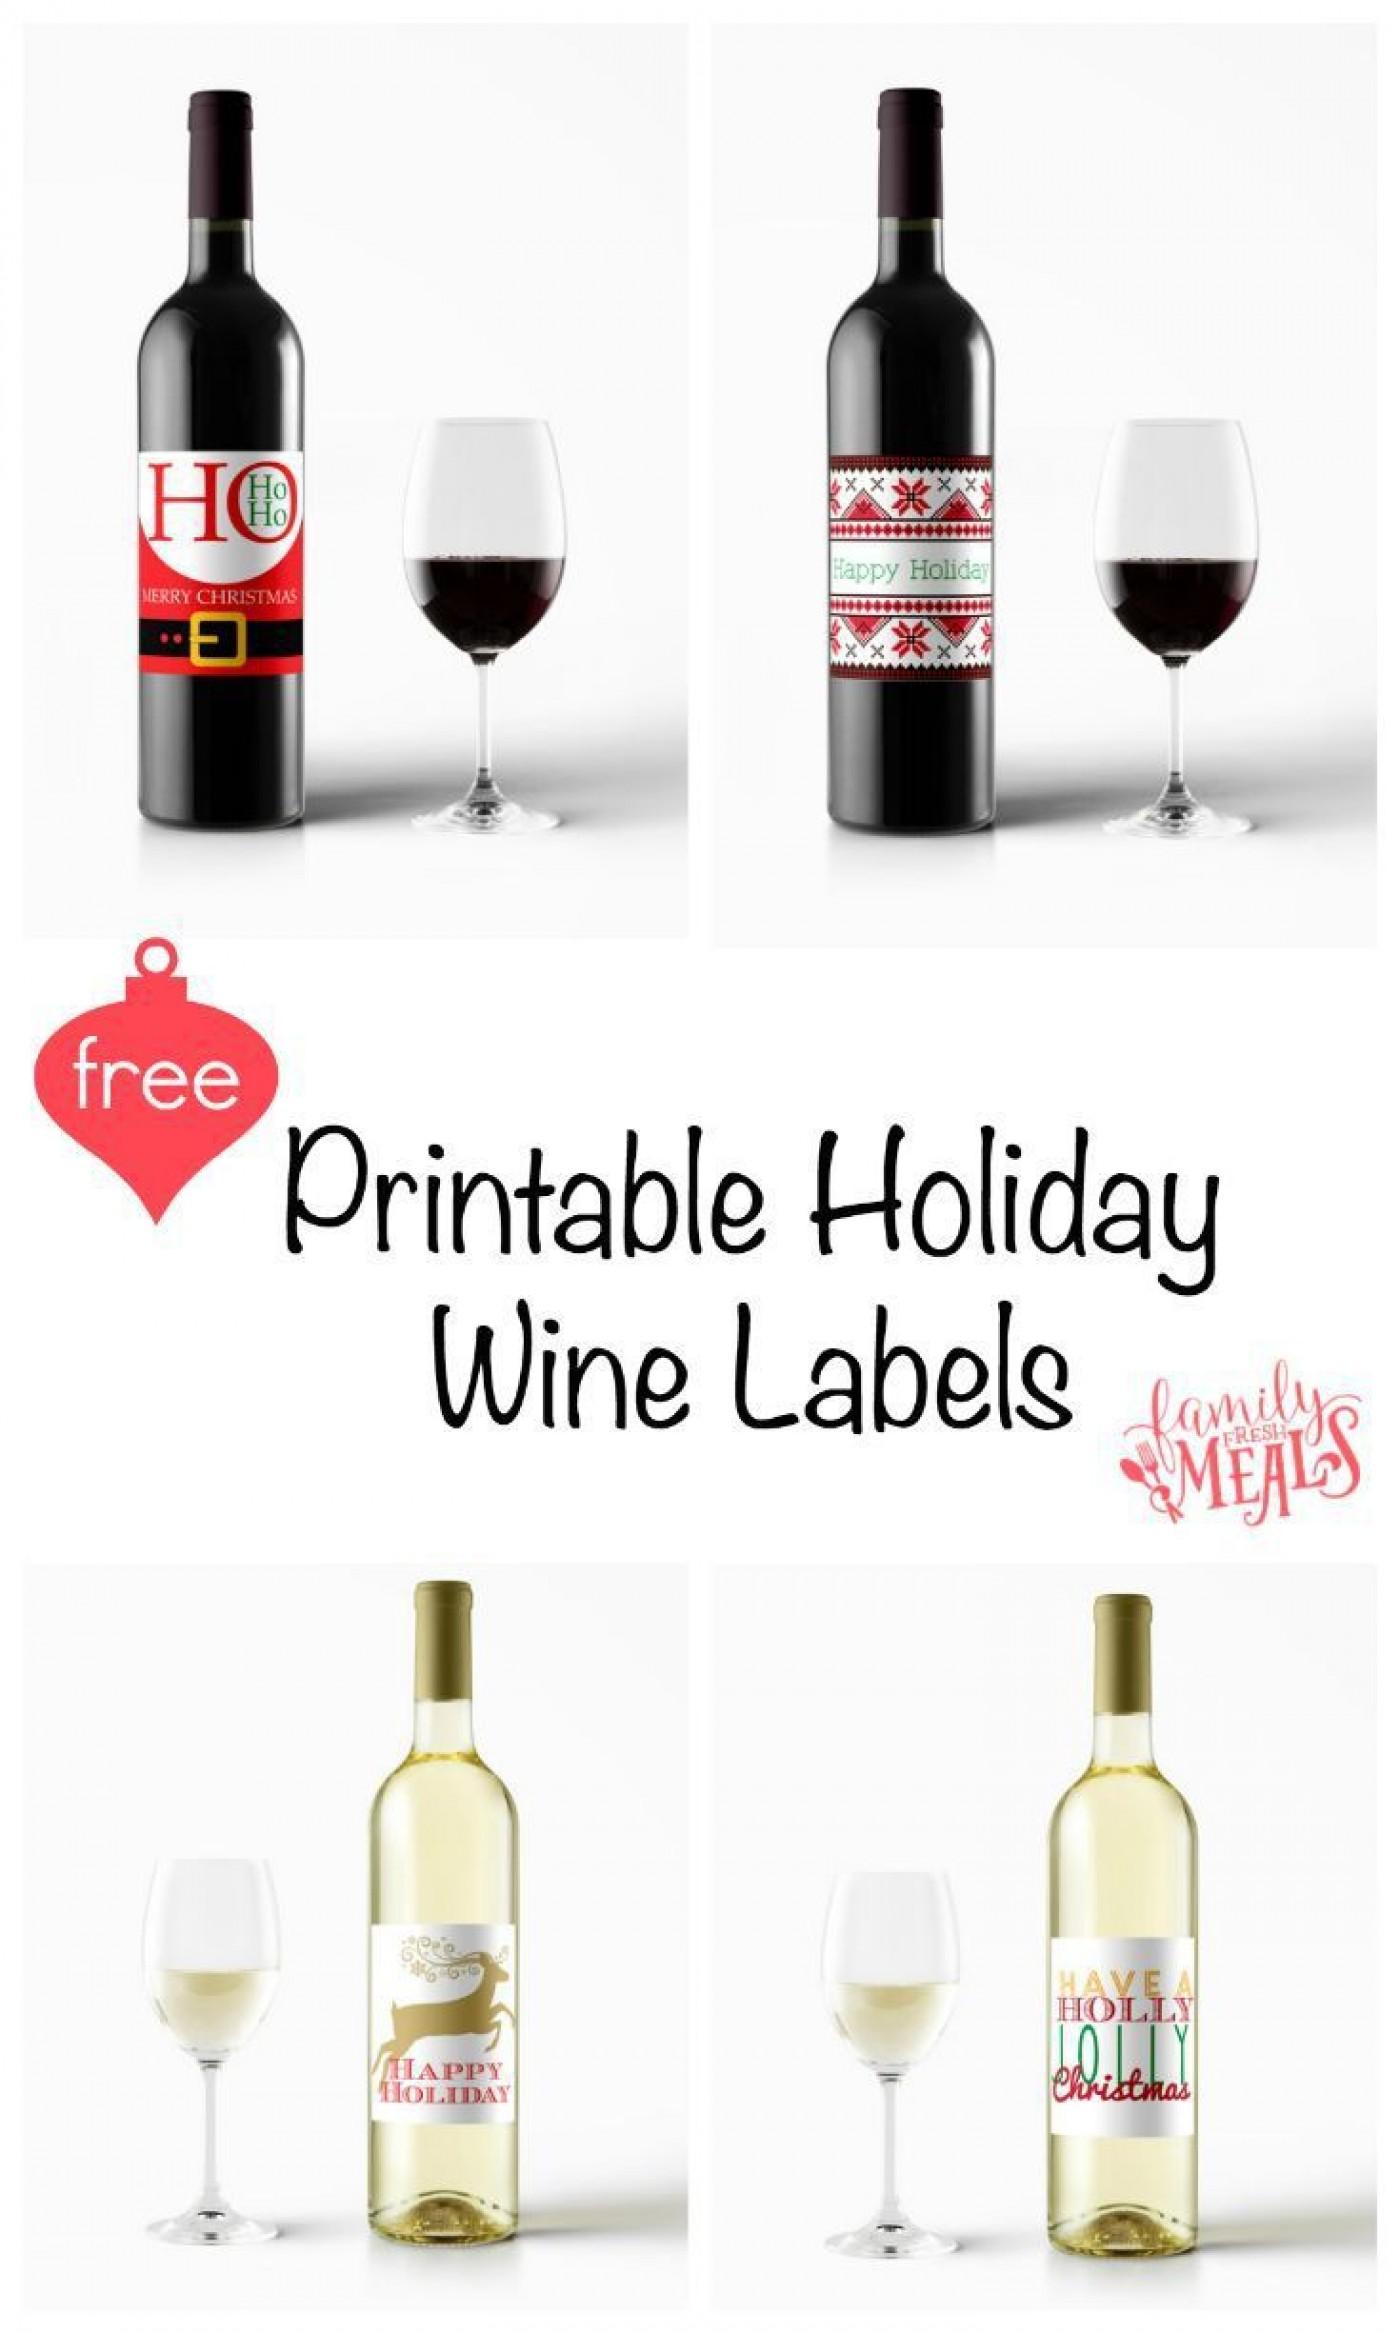 001 Singular Free Wine Label Template Design  Bottle Microsoft Word Online Psd1400